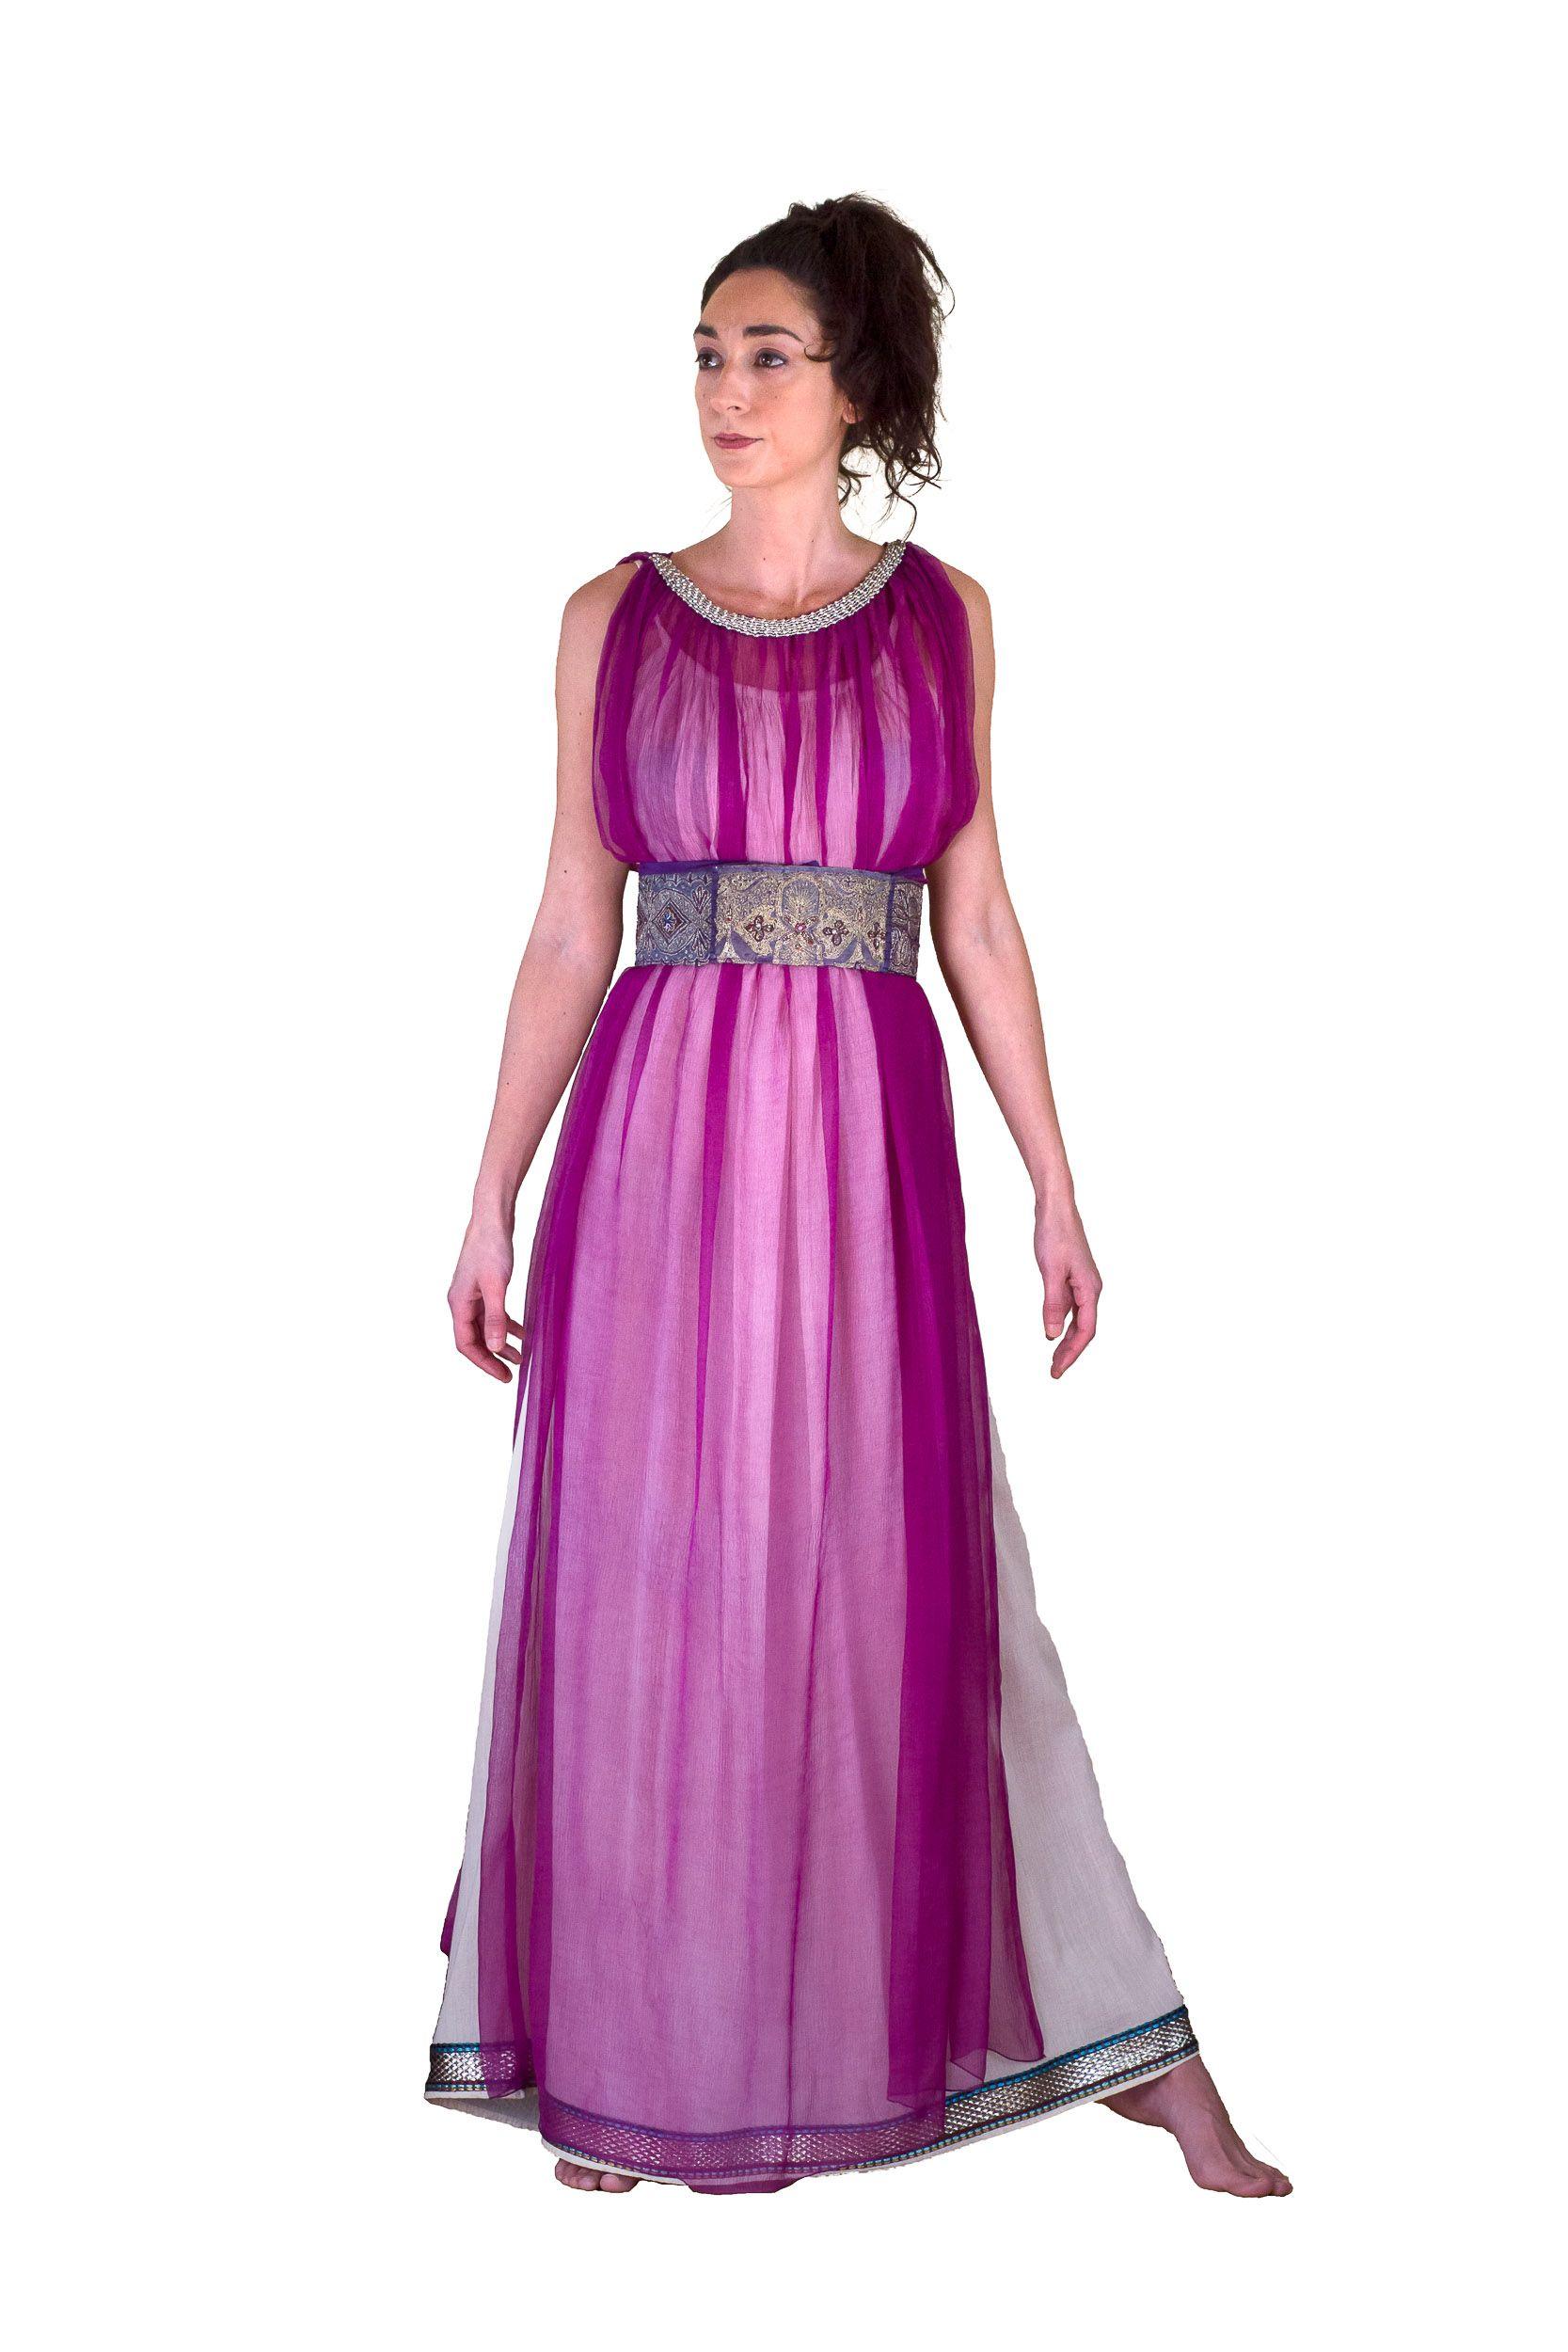 Vestimenta romana Galia | Disfraces | Pinterest | Pedreria, Gasa y ...